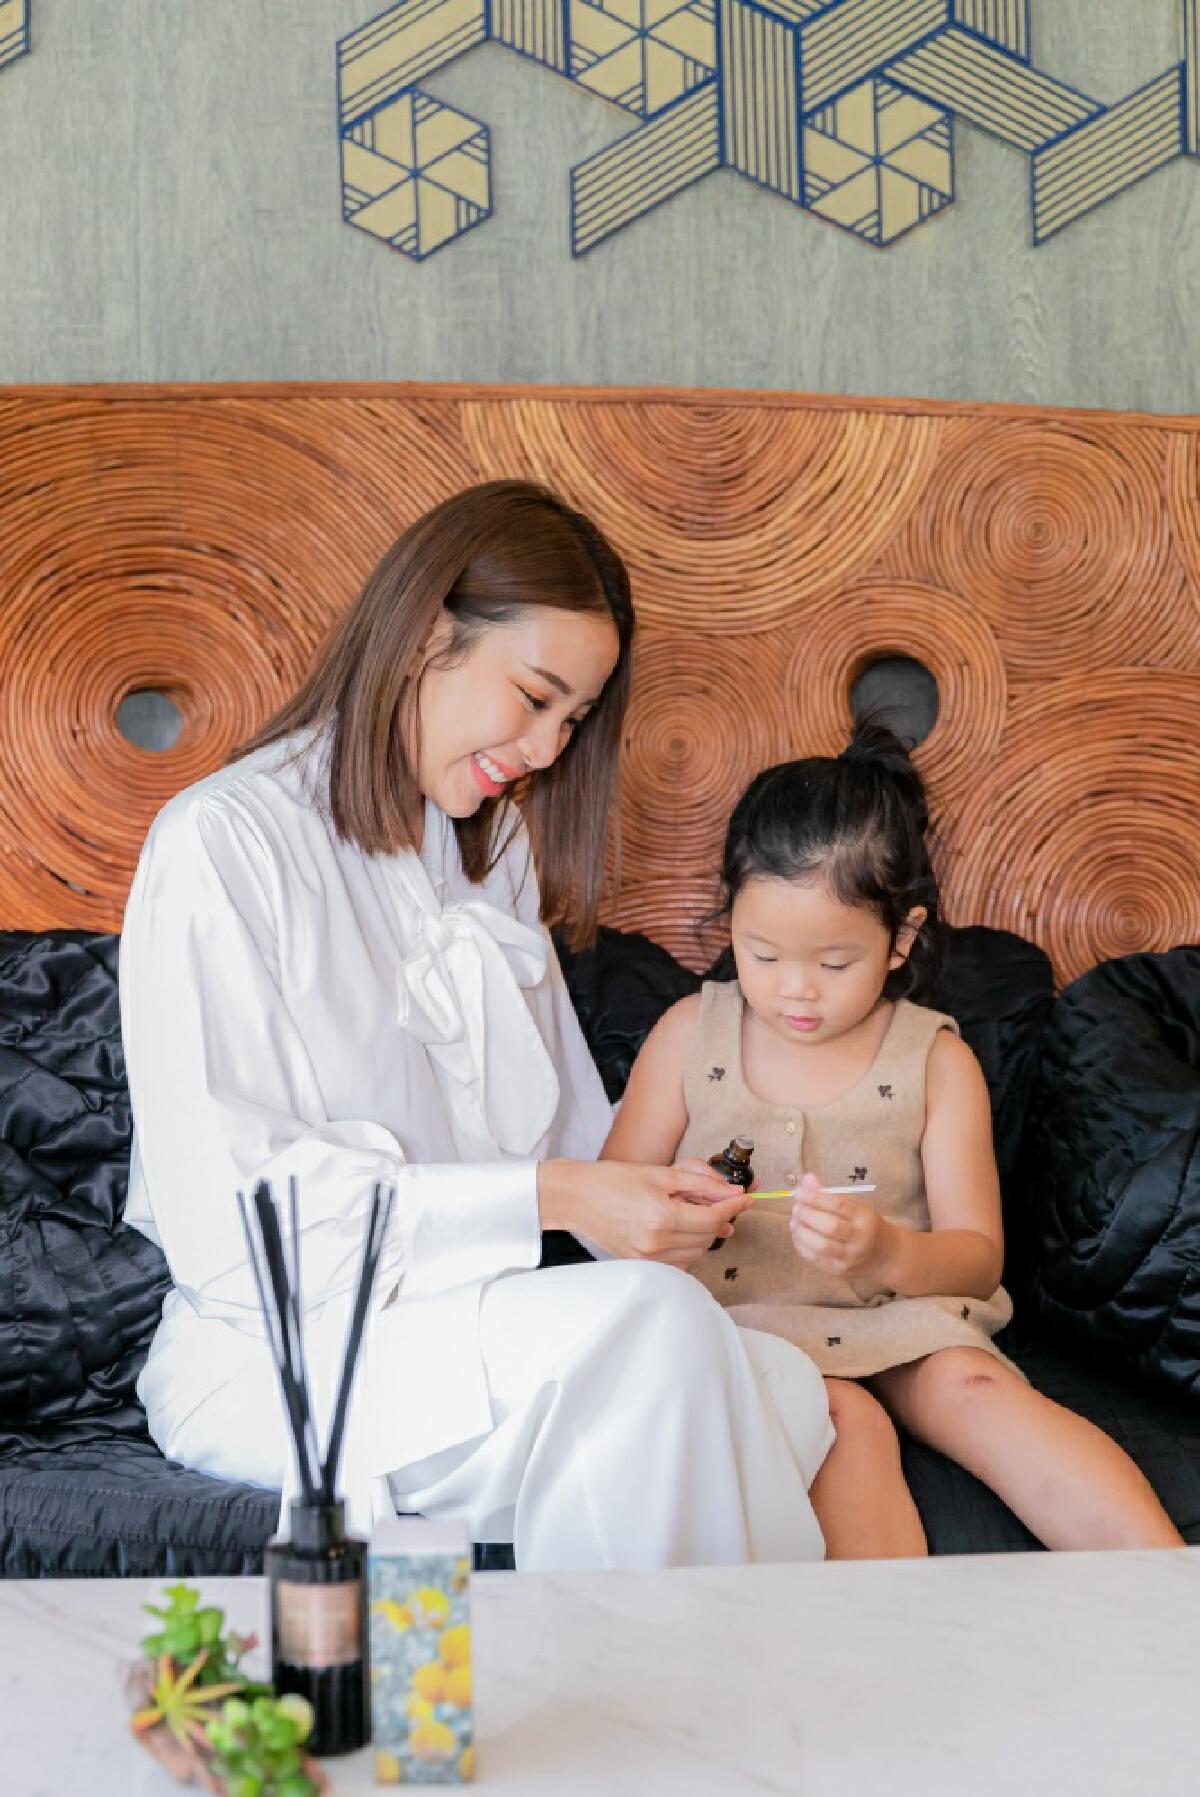 THANN ชวนคุณแม่ร่วมสร้างพัฒนาการลูกน้อย ใช้ศาสตร์กลิ่นหอม เสริมสร้างบรรยากาศในครอบครัว